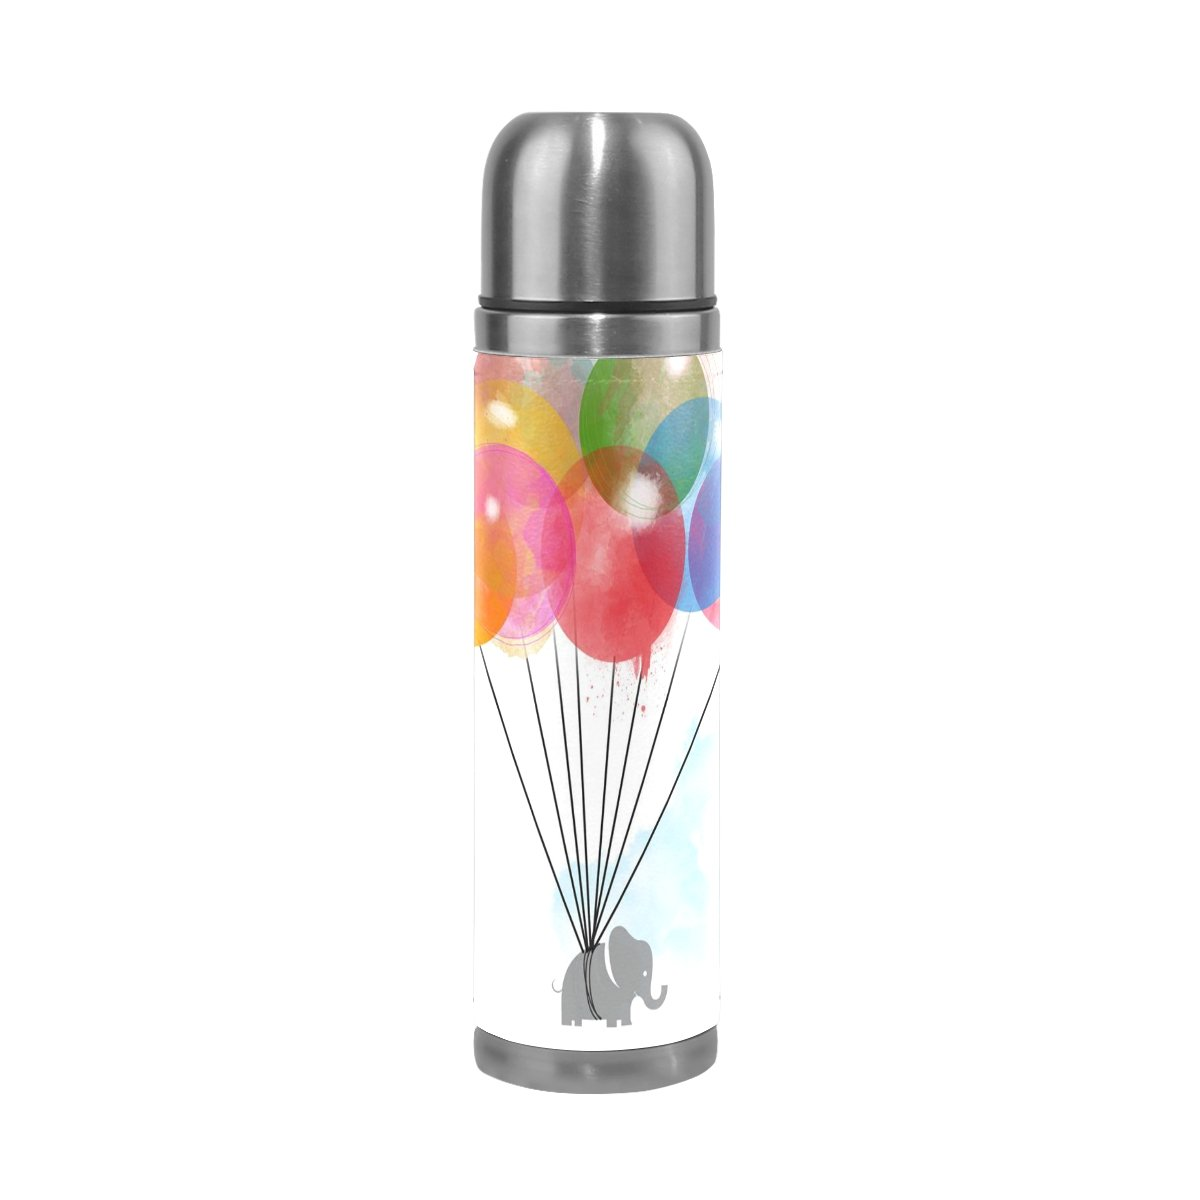 jstel globo aislado al vacío botella de de agua de acero inoxidable a prueba de botella fugas botella de vacío doble para café caliente o frío taza de té + bebida Top 500 ml fc15a2